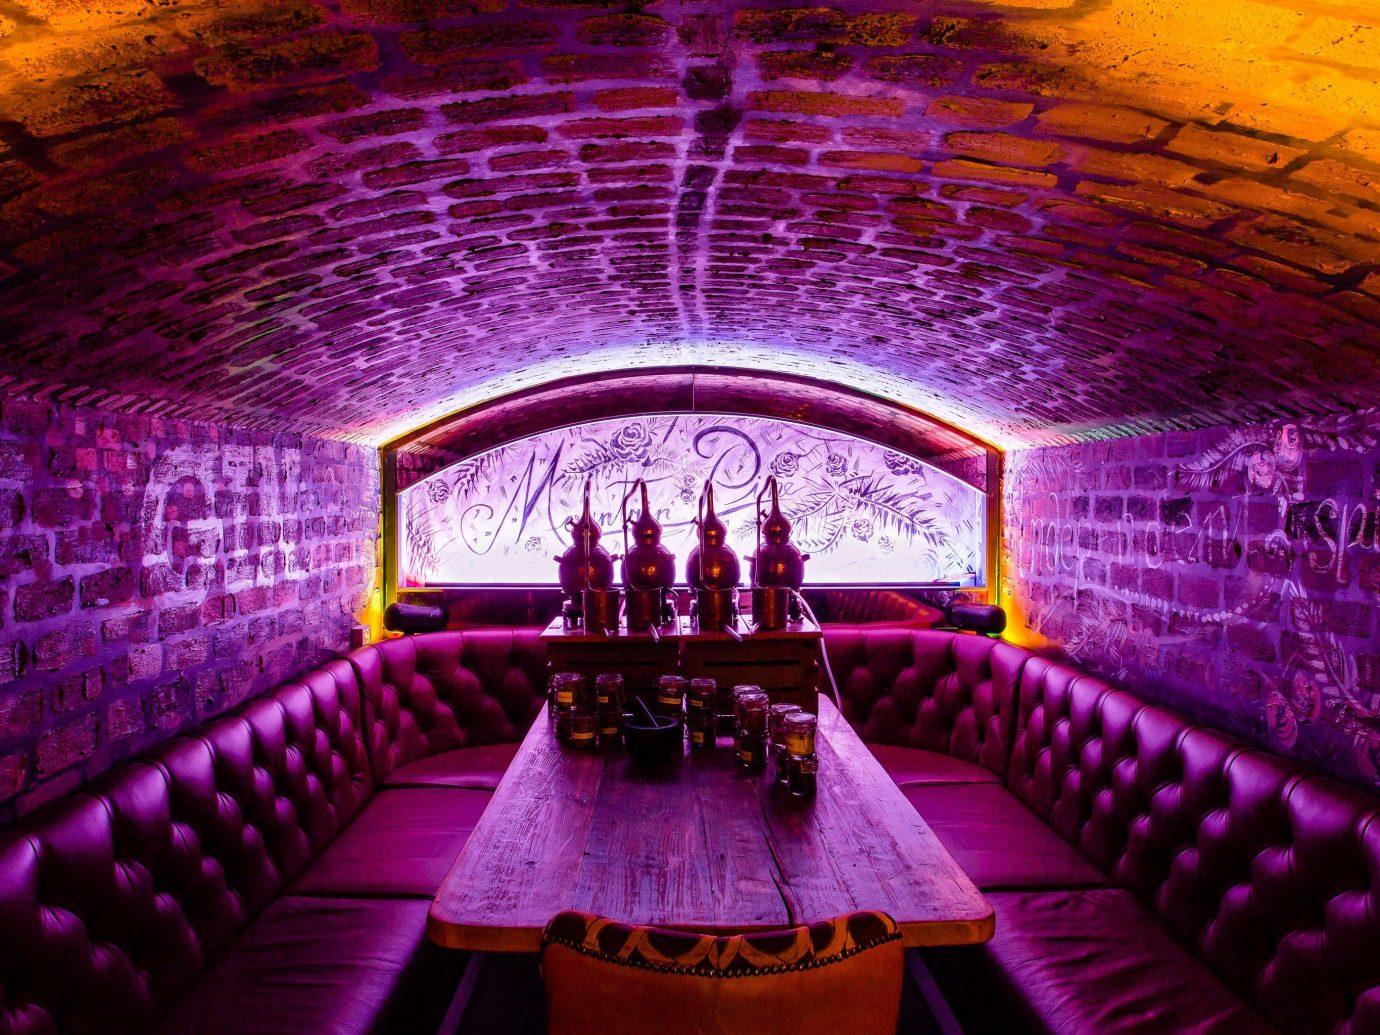 Edinburgh Hotels Jetsetter Guides Scotland Travel Tips Trip Ideas purple light Architecture lighting symmetry magenta theatre function hall auditorium